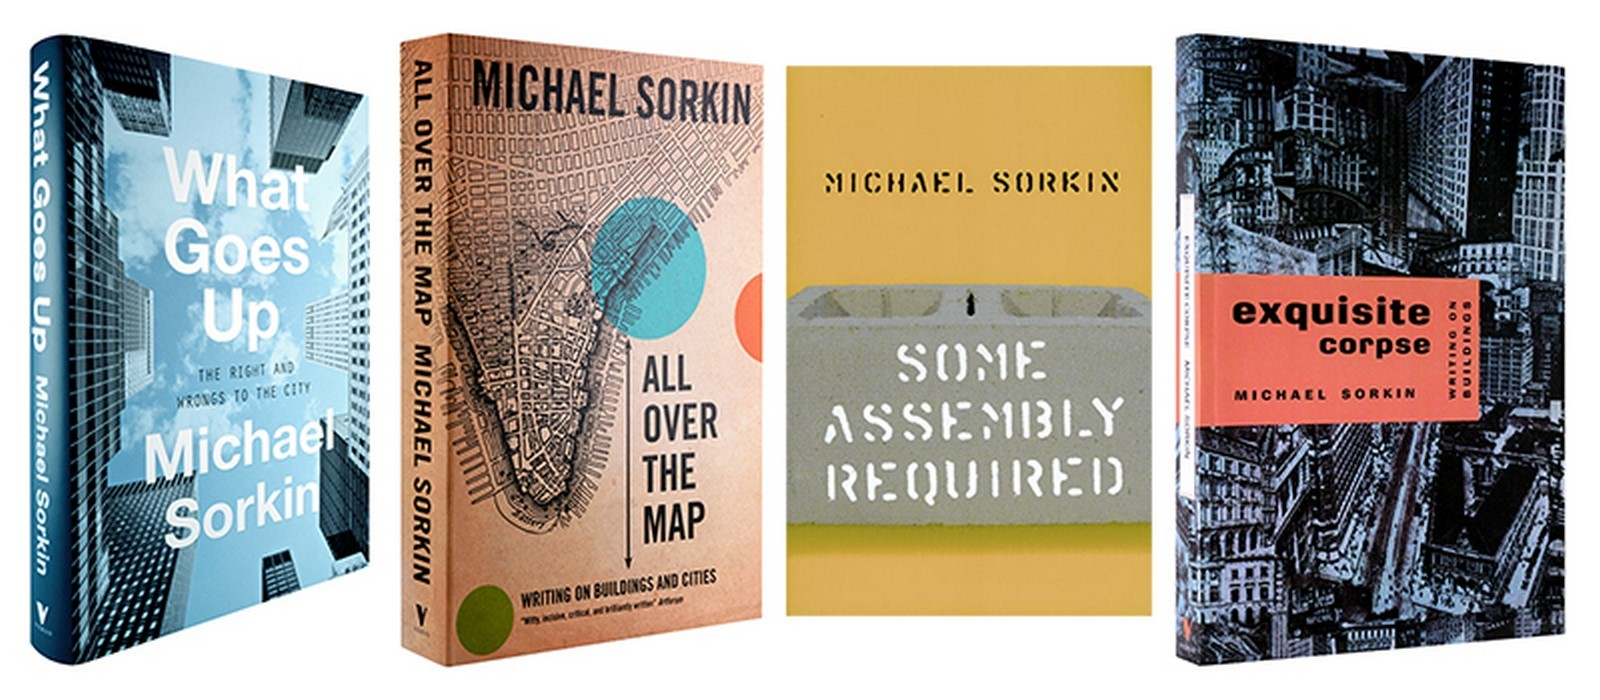 MICHAEL DAVID SORKIN- AMERICAN CRITIC - Sheet2